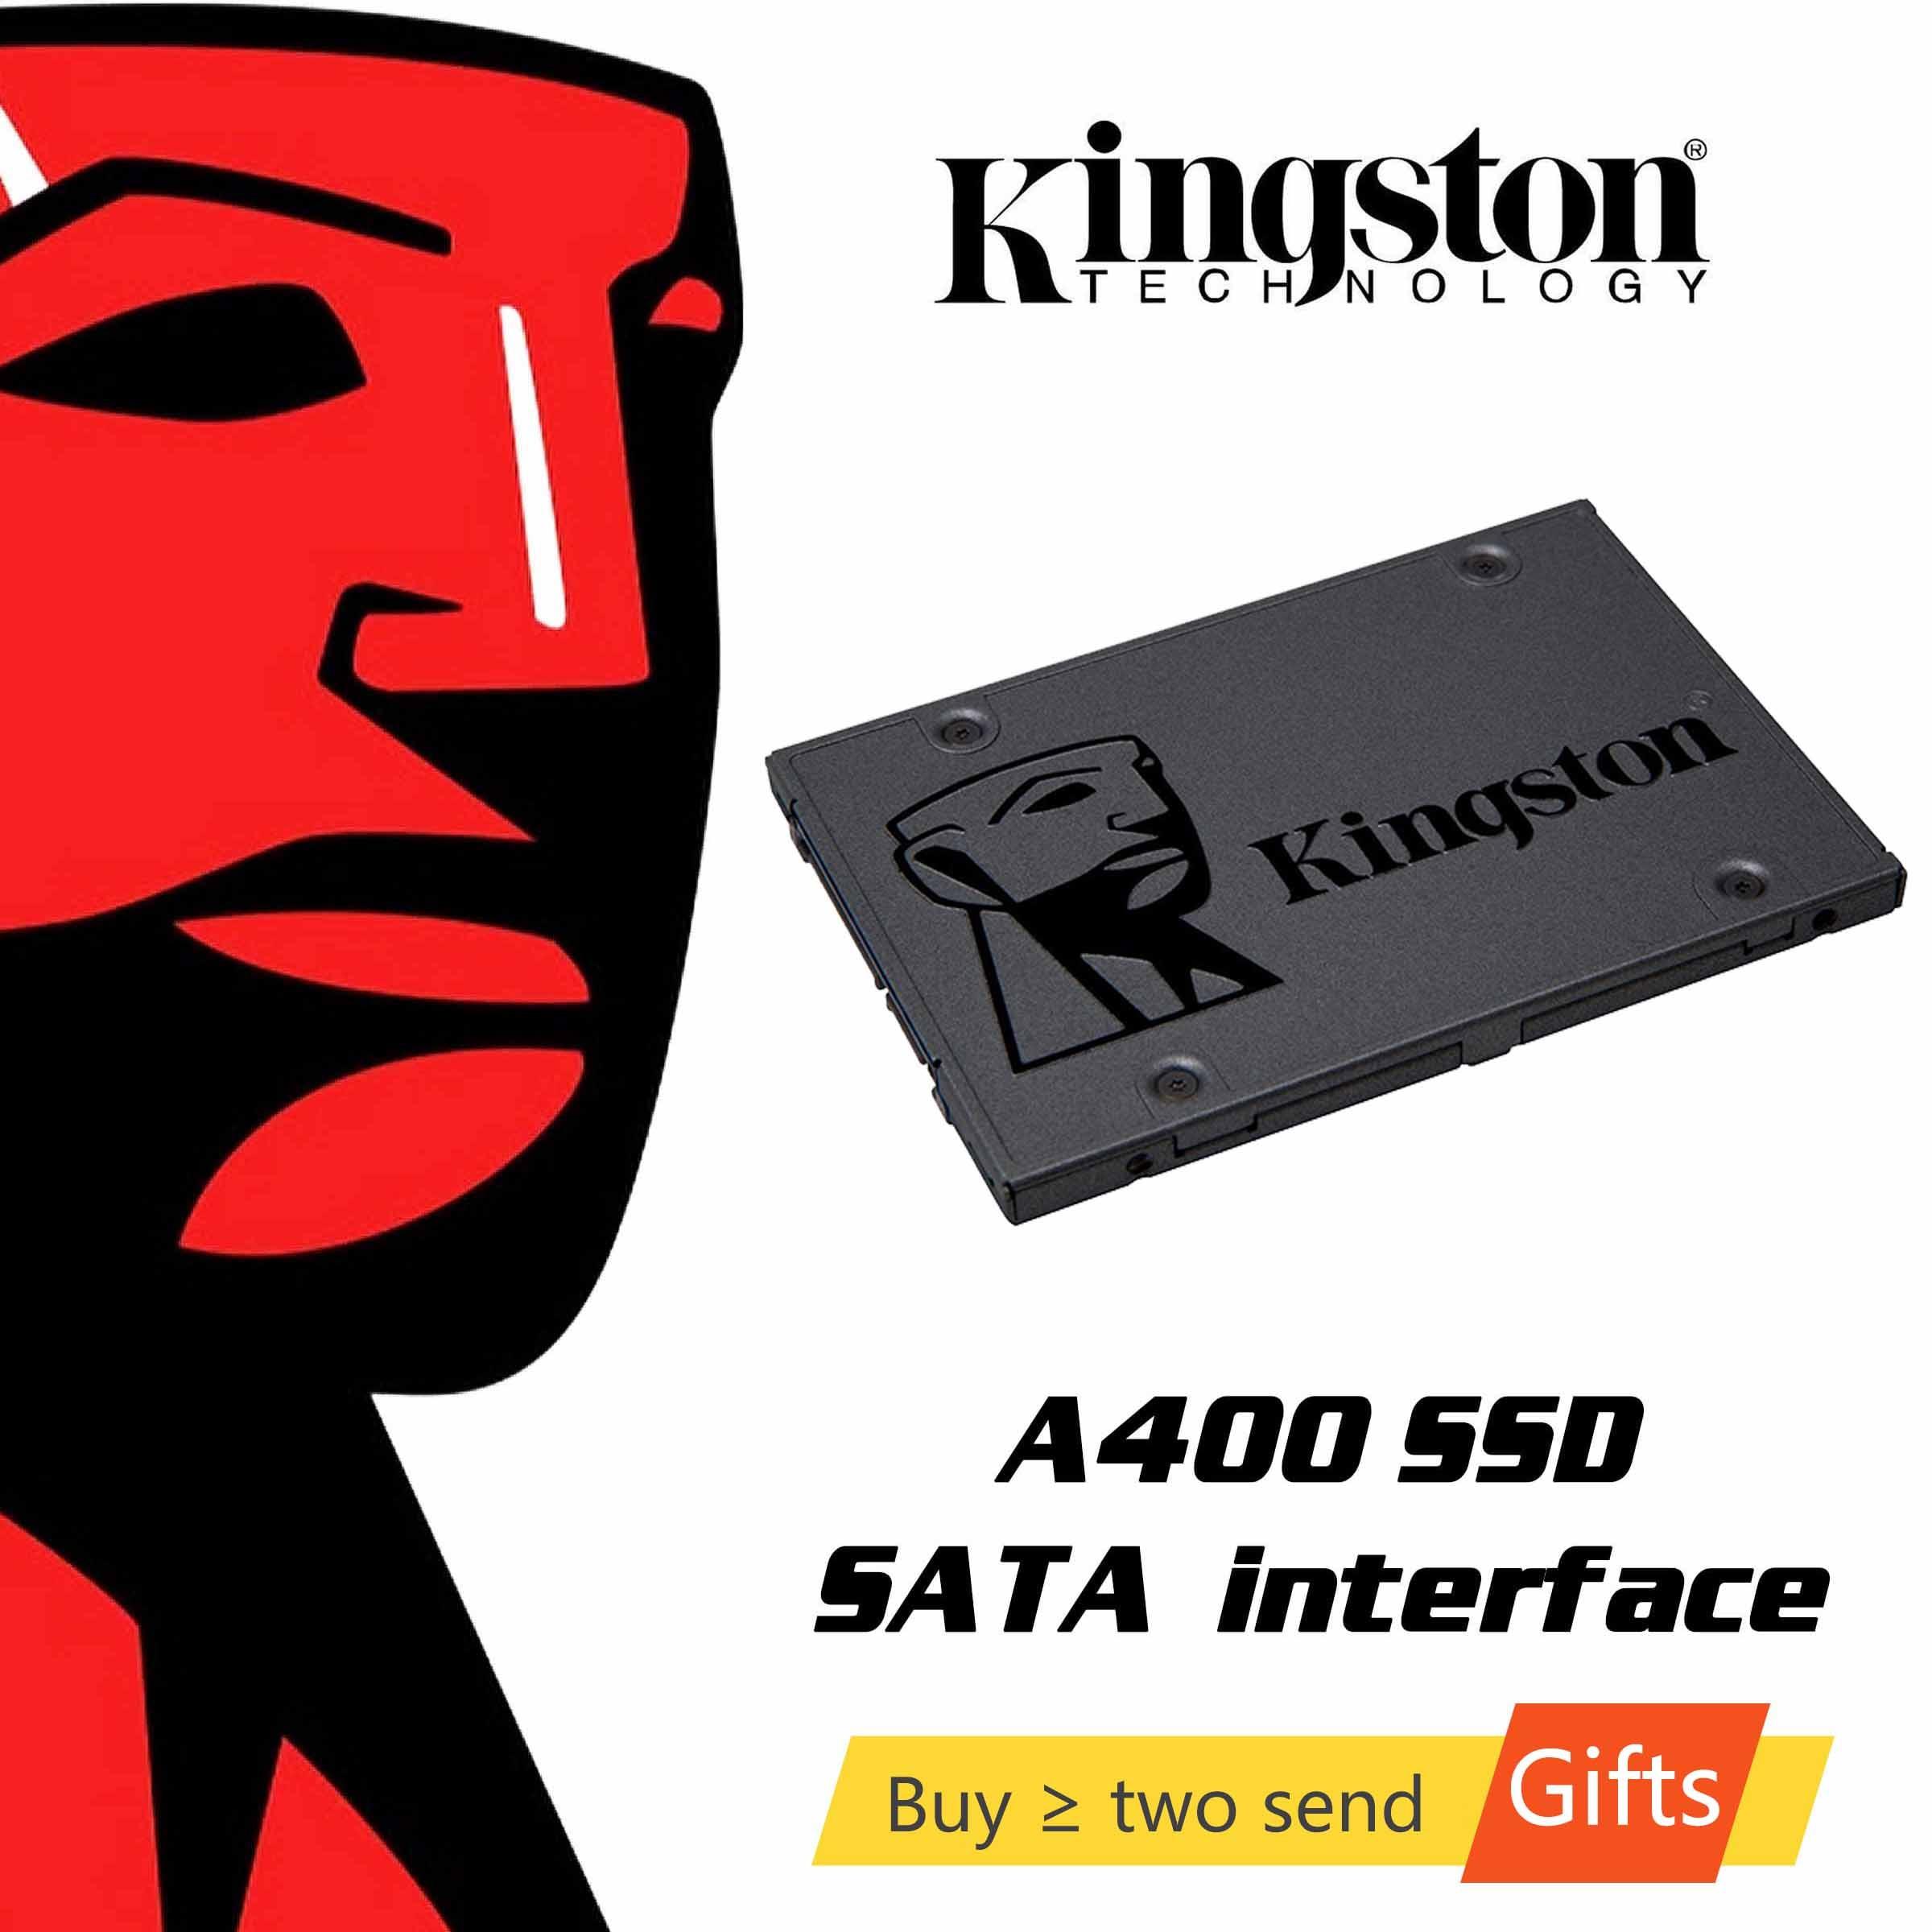 Kingston SSD 120gb 240 gb 480gb HDD 2.5'' SATA SATAIII 960gb 120 240 hdhard disk Internal Solid State Drive for Laptop